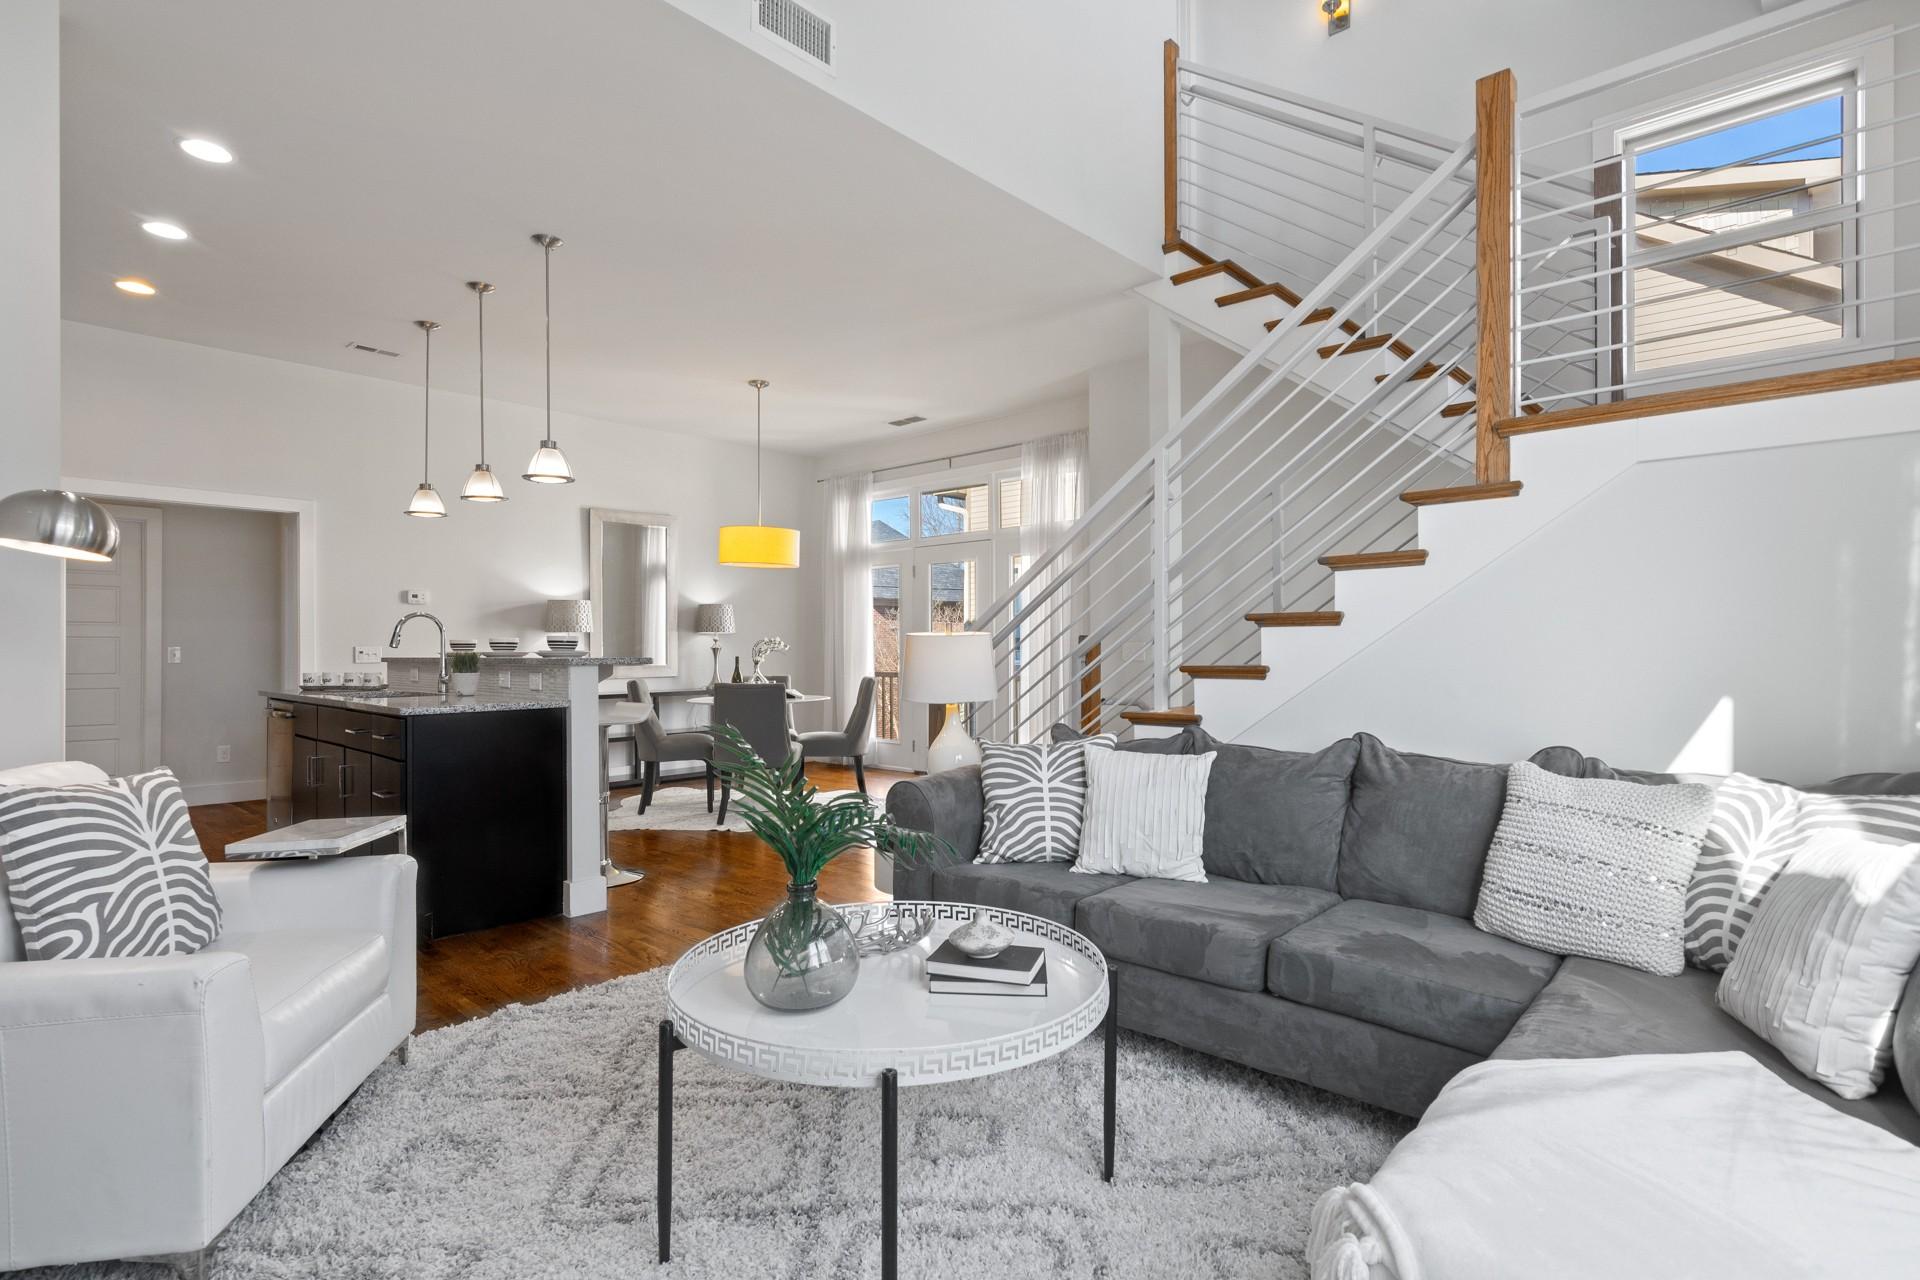 393 Monroe St Property Photo - Nashville, TN real estate listing